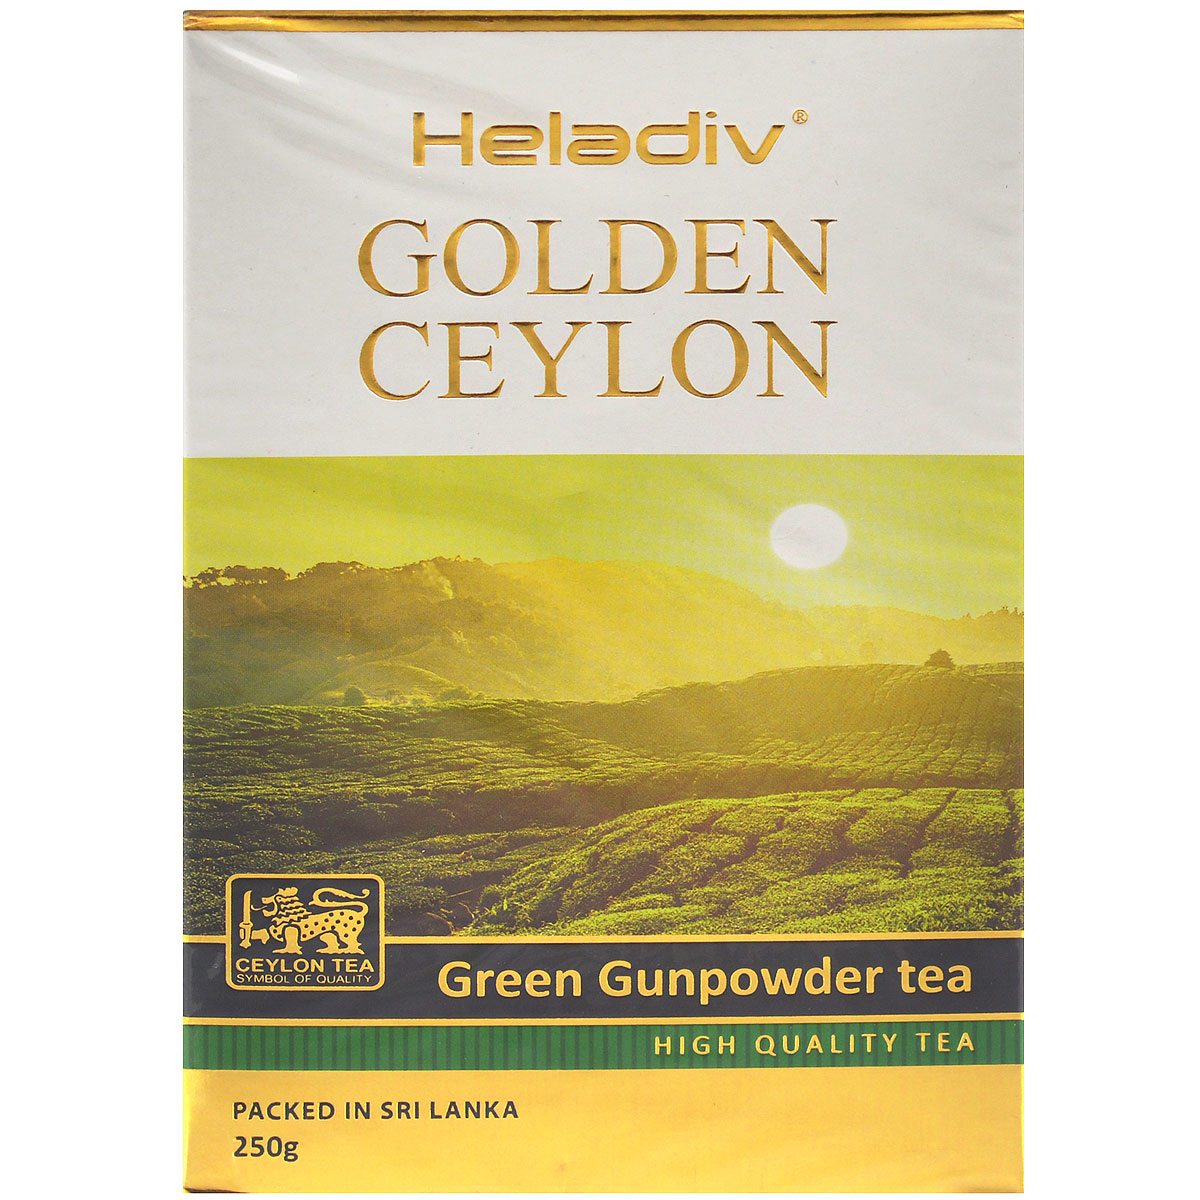 Heladiv Golden Ceylon Green Gunpowder зеленый листовой чай, 250 г цена